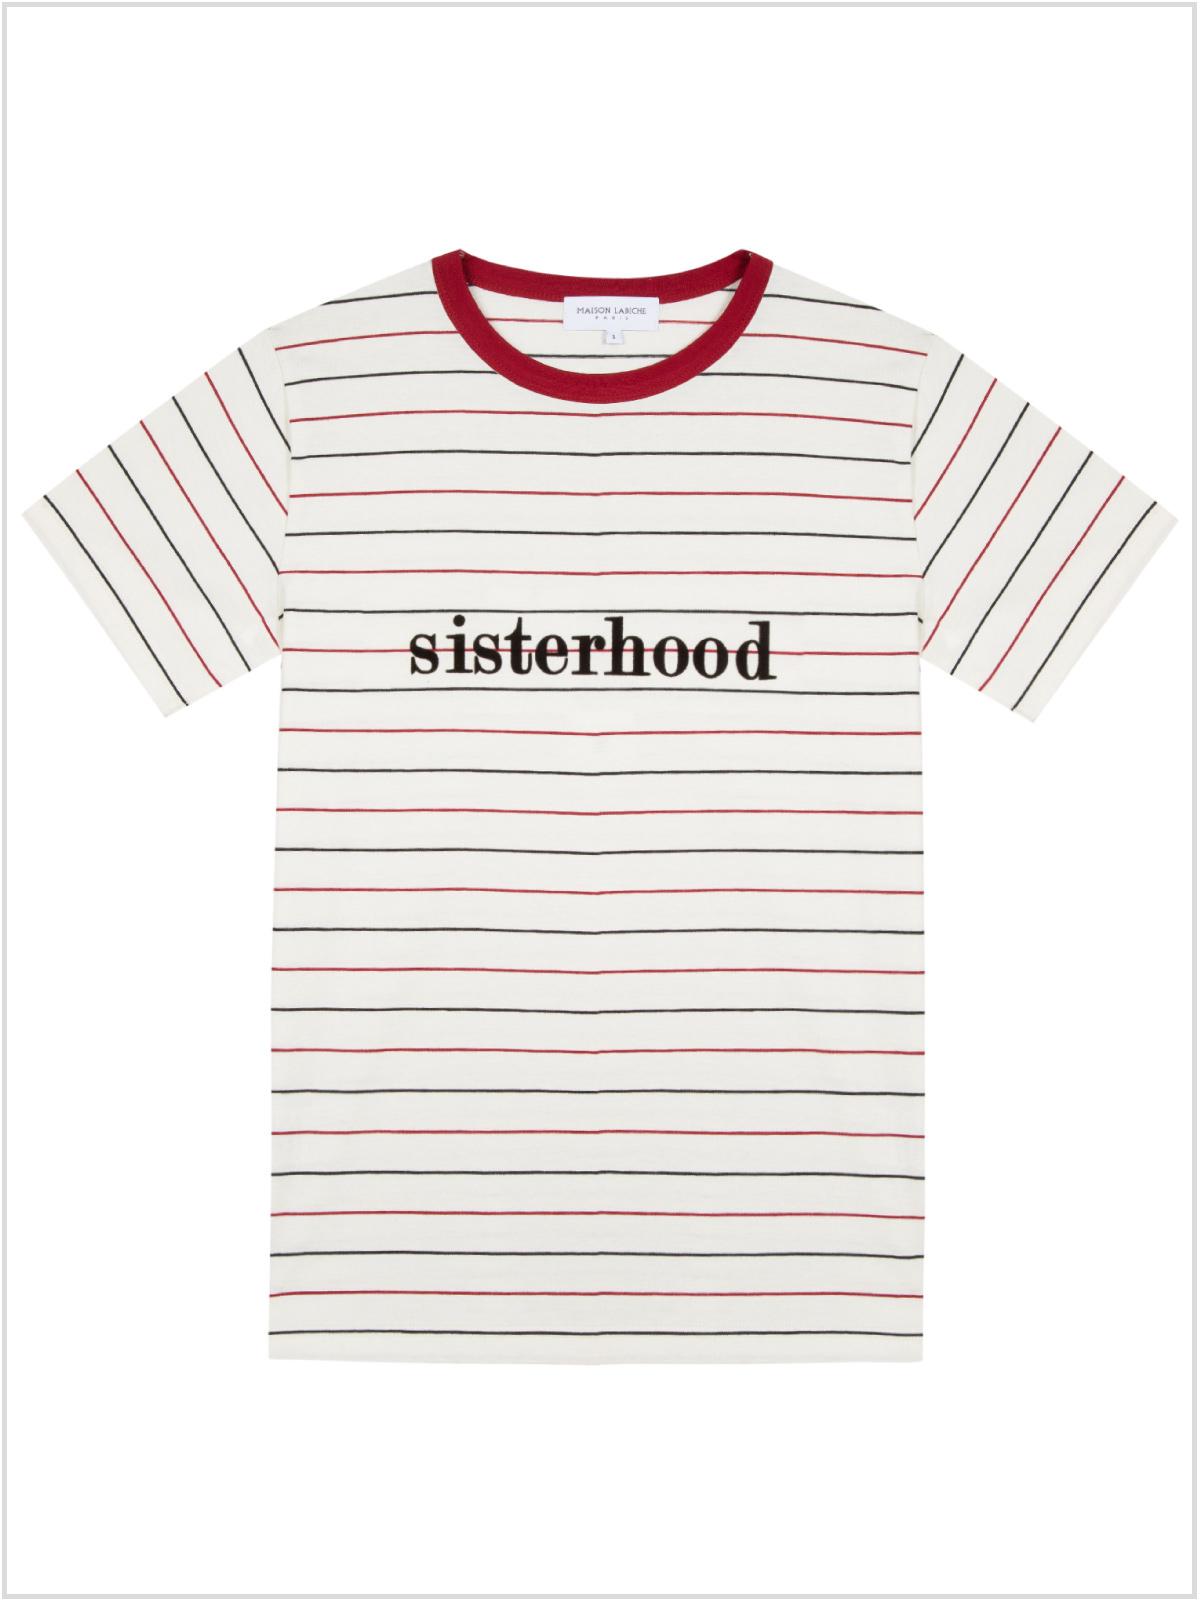 frederickandsophie-womenswear-style-maisonlabiche-Tshirt-sisterhood